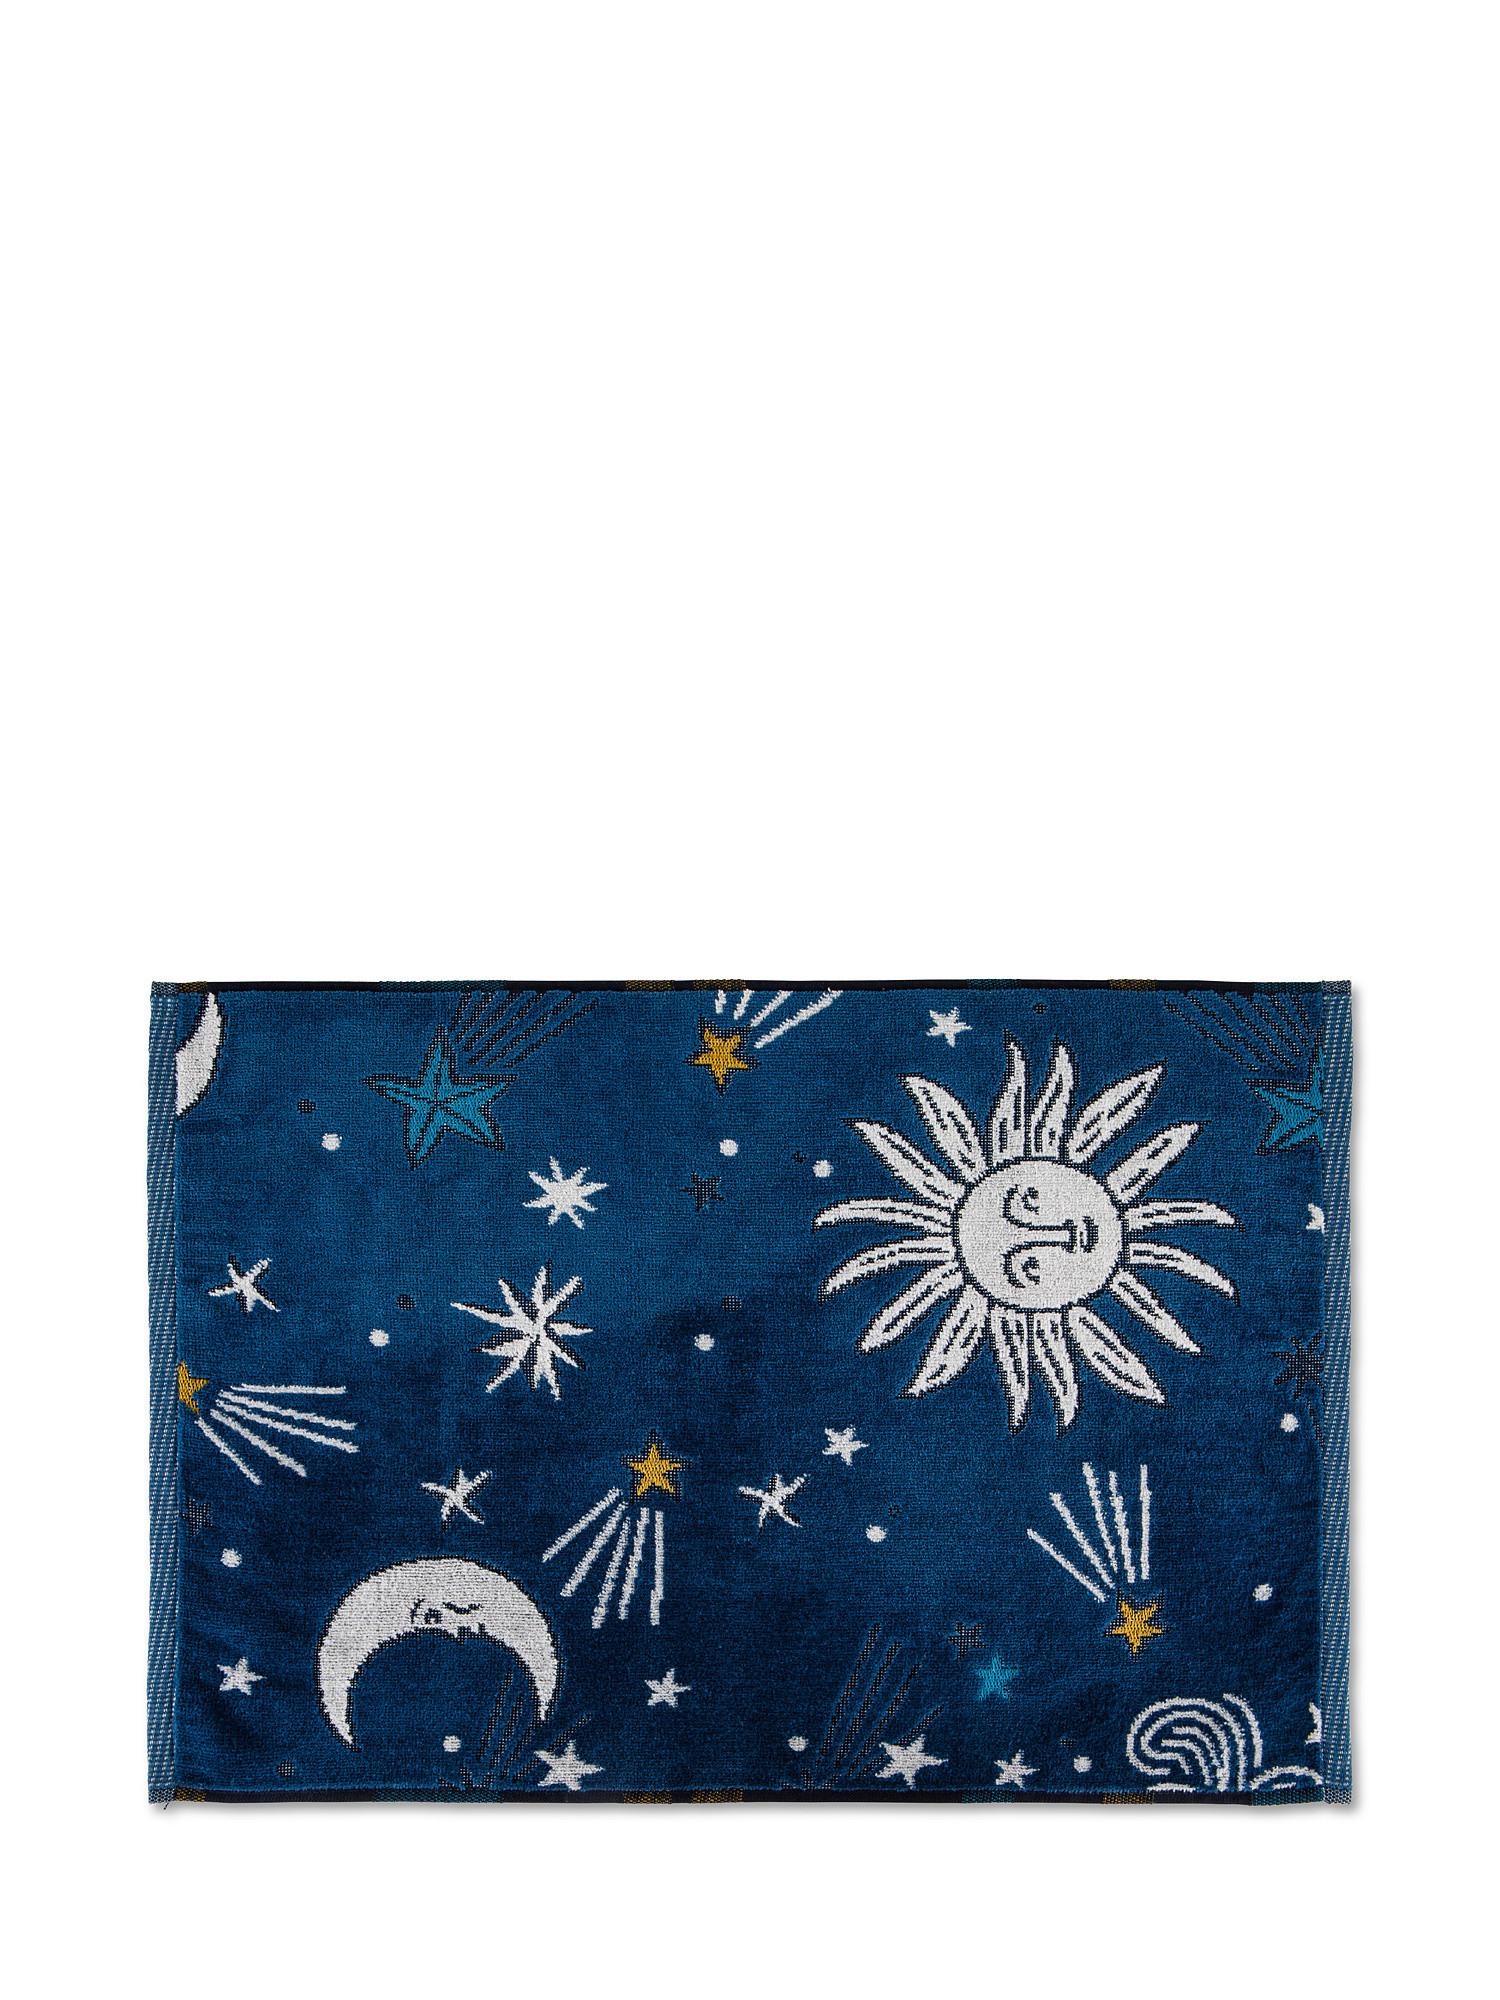 Asciugamano cotone velour motivo tarocchi, Blu, large image number 1